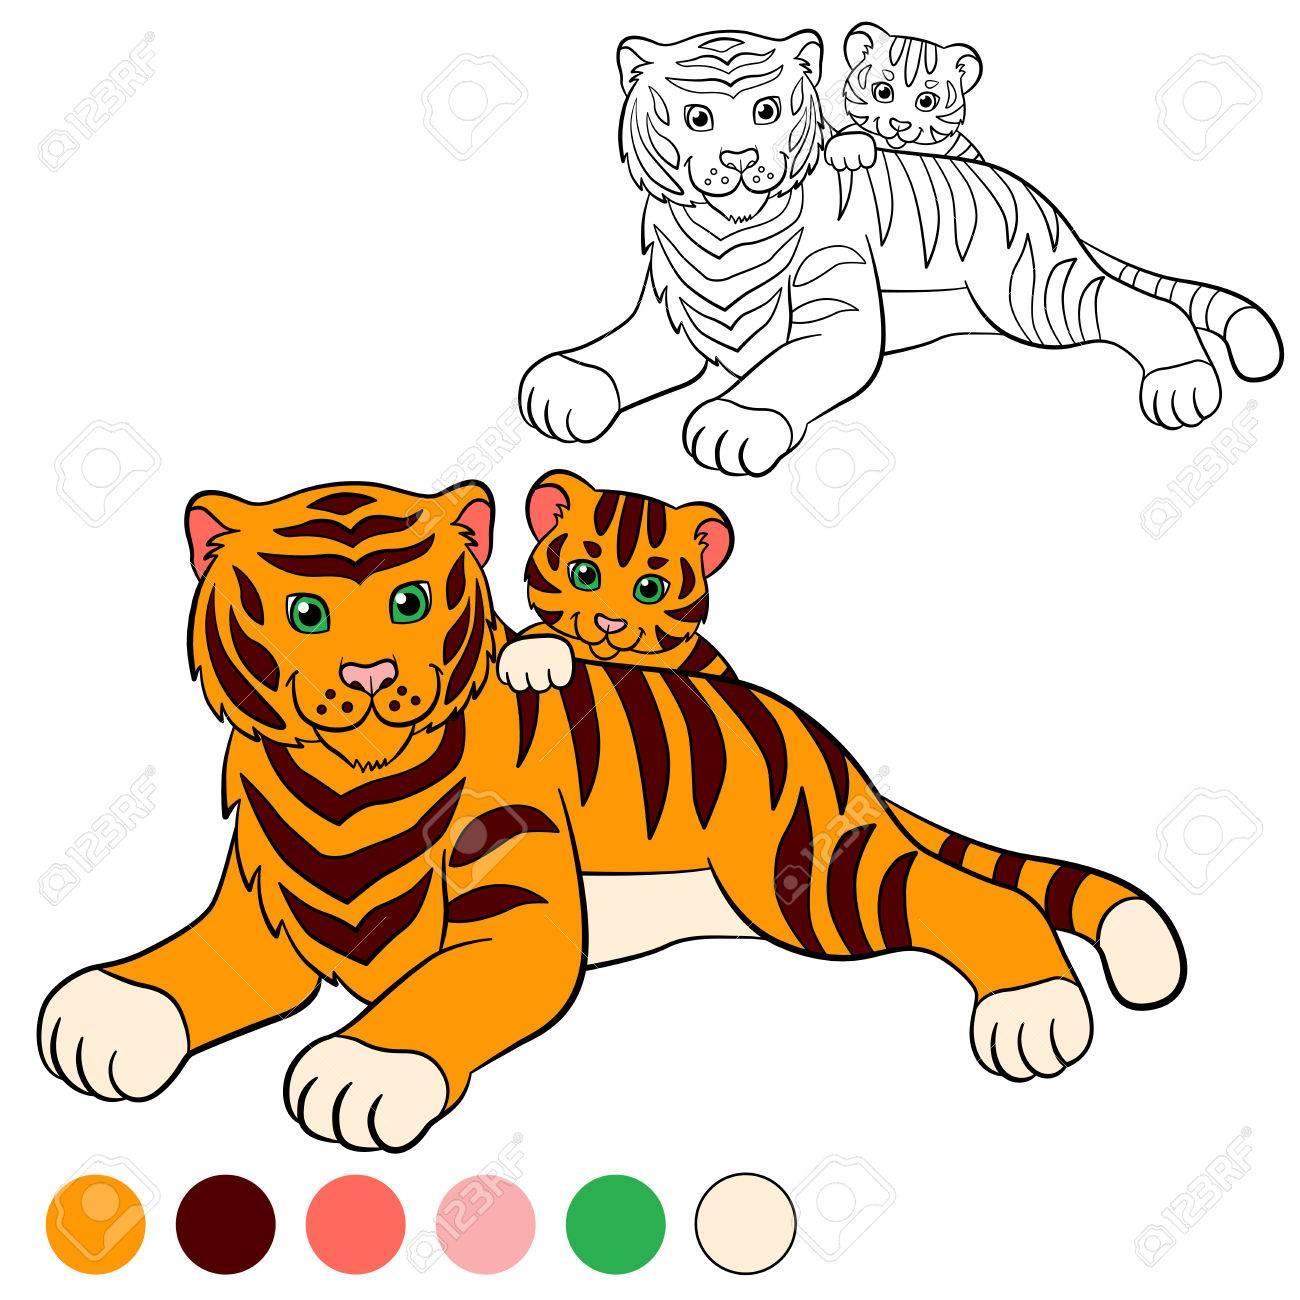 Dibujo Para Colorear. Color Me Tigre. Tigre Madre Establece Con Su ...